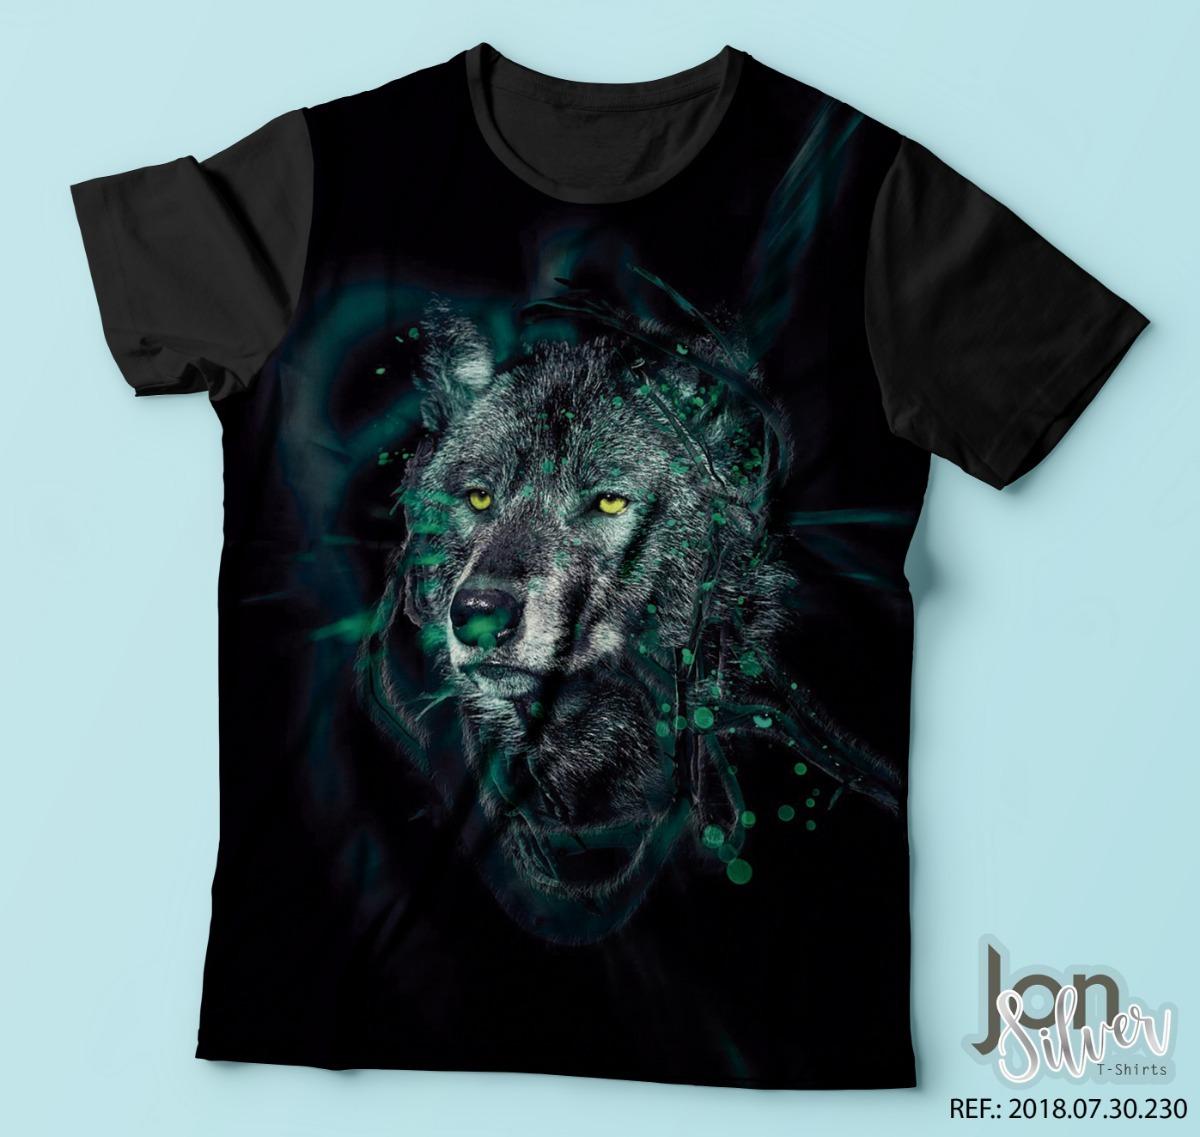 bb1849333 camisa camiseta estampada lobo negro colorido moda. Carregando zoom.